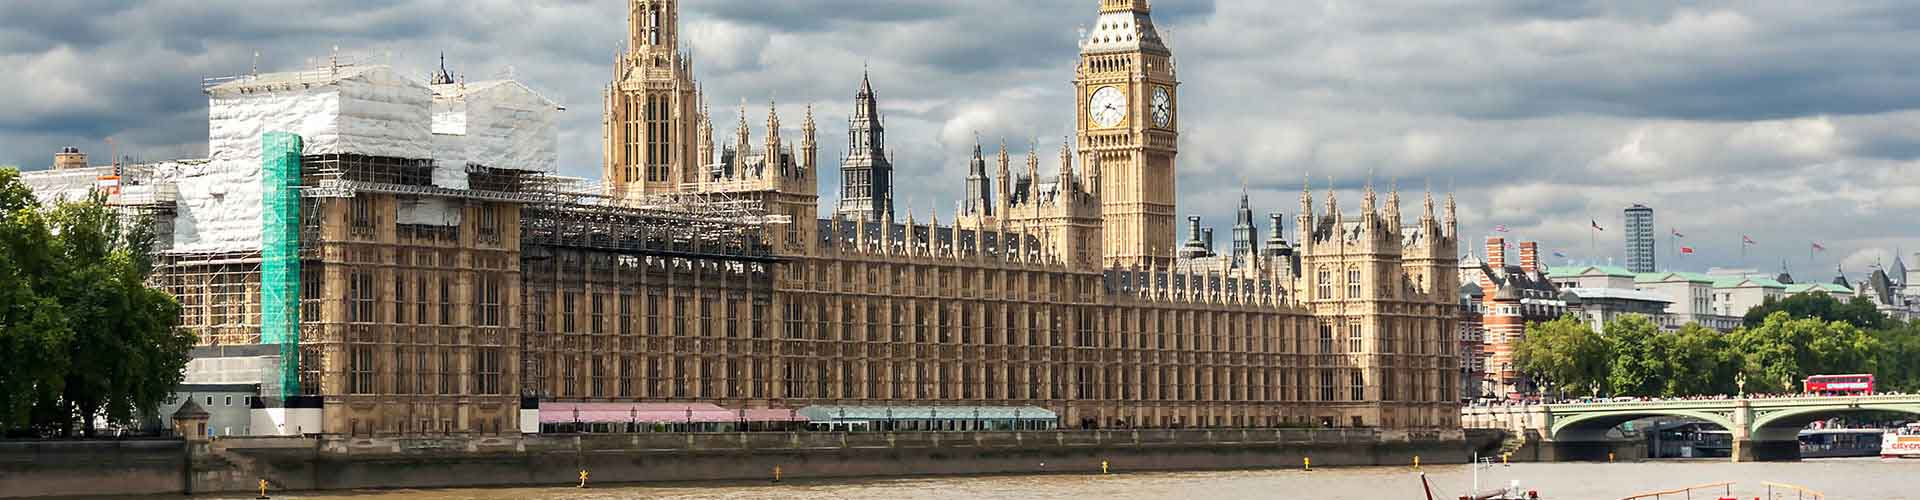 Londres - Albergues Juveniles cerca a Palacio de Westminster. Mapas de Londres, Fotos y Comentarios para cada Albergue Juvenil en Londres.